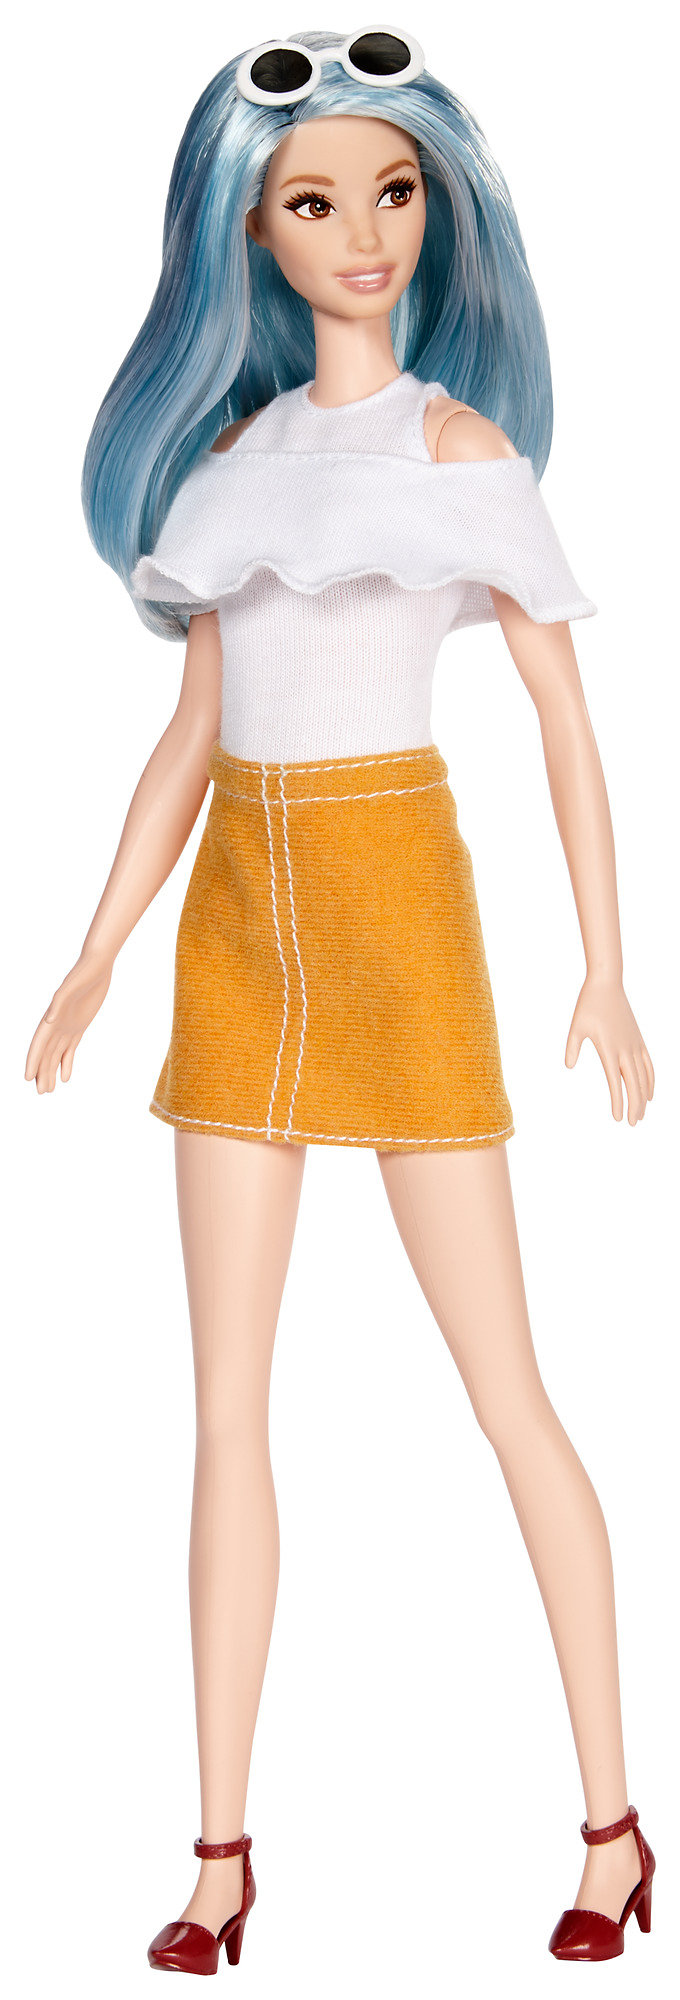 Barbie Fashionistas Blue Beauty, Tall Body Doll by Mattel